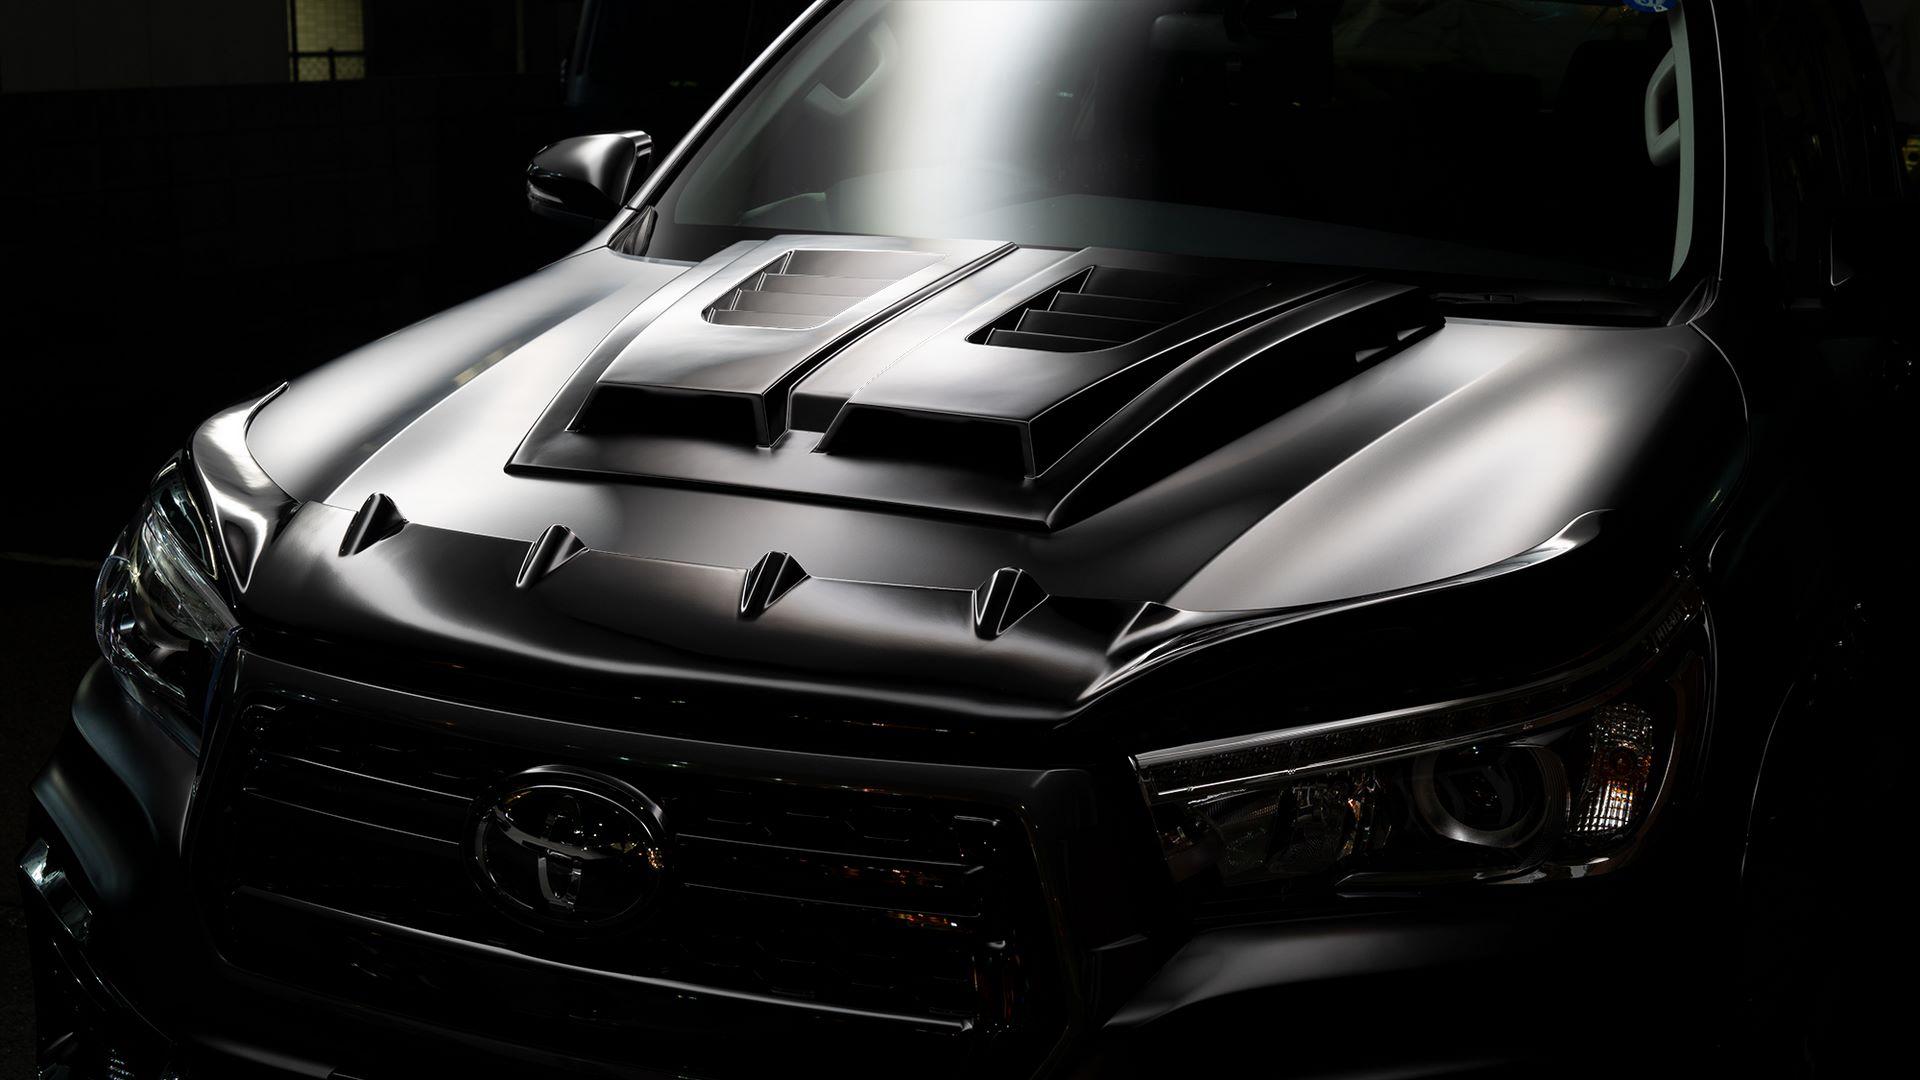 Toyota-Hilux-Black-Bison-by-Wald-International-3